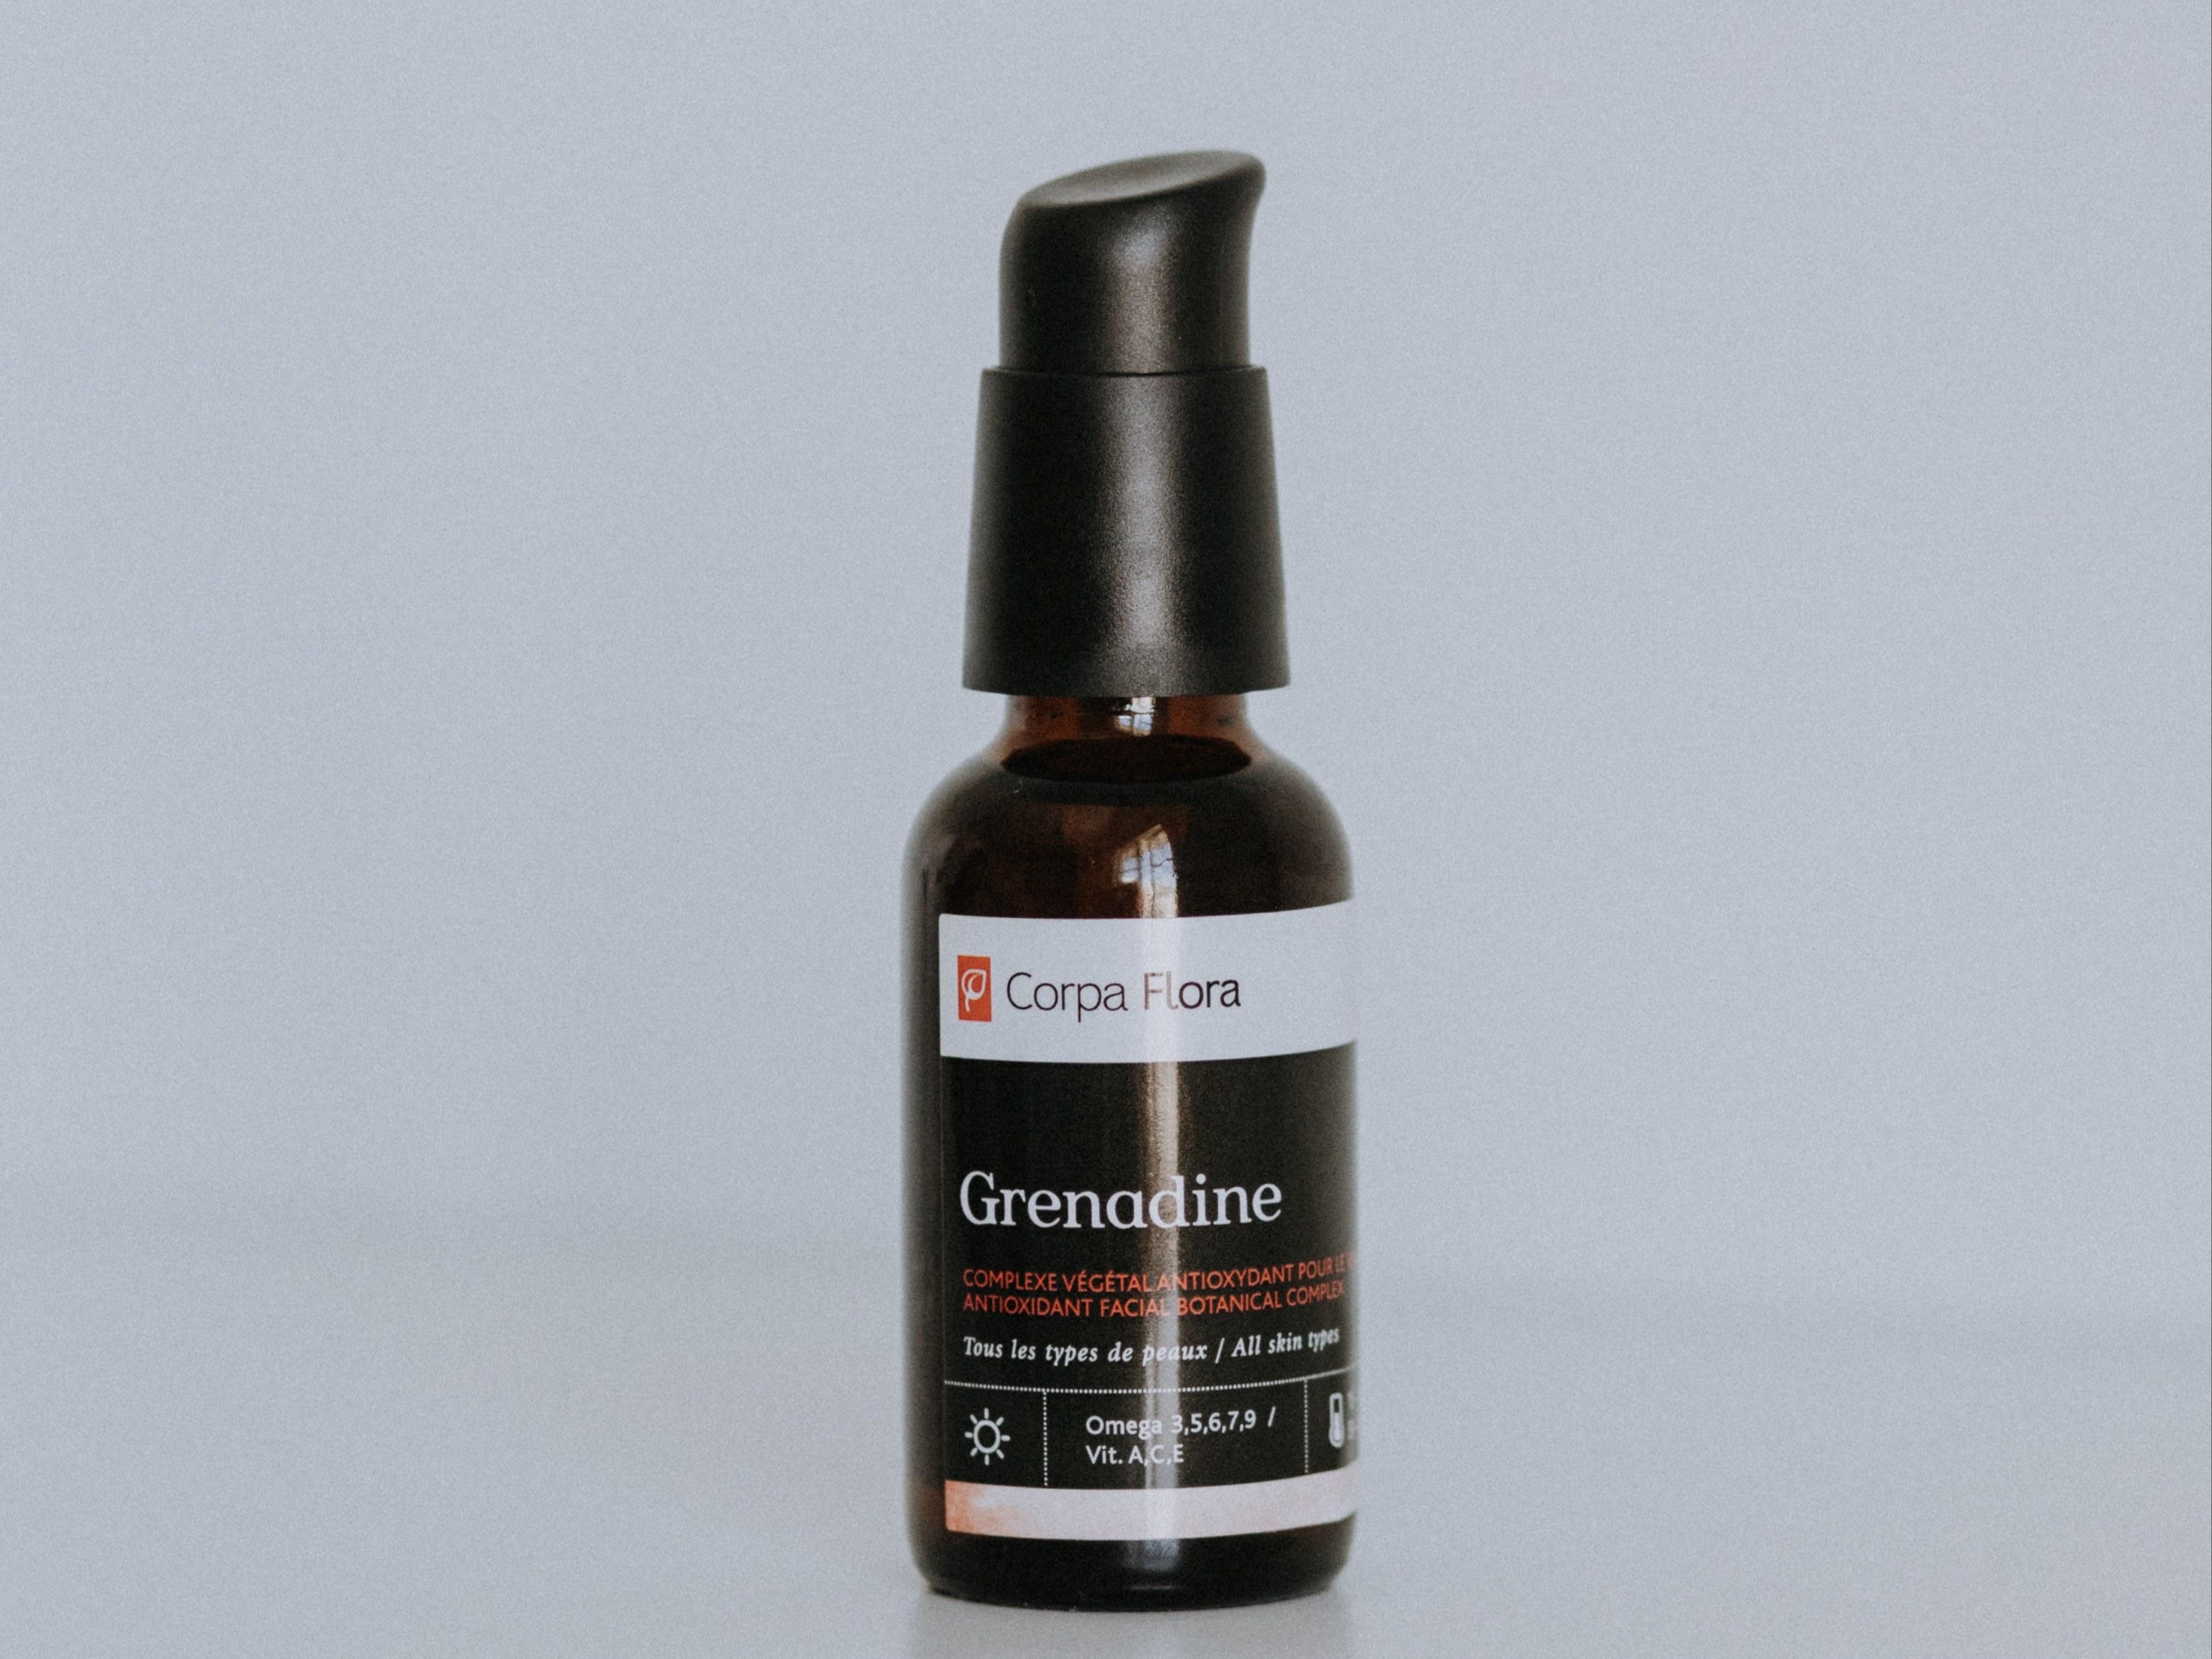 Corpa Flora grenadine